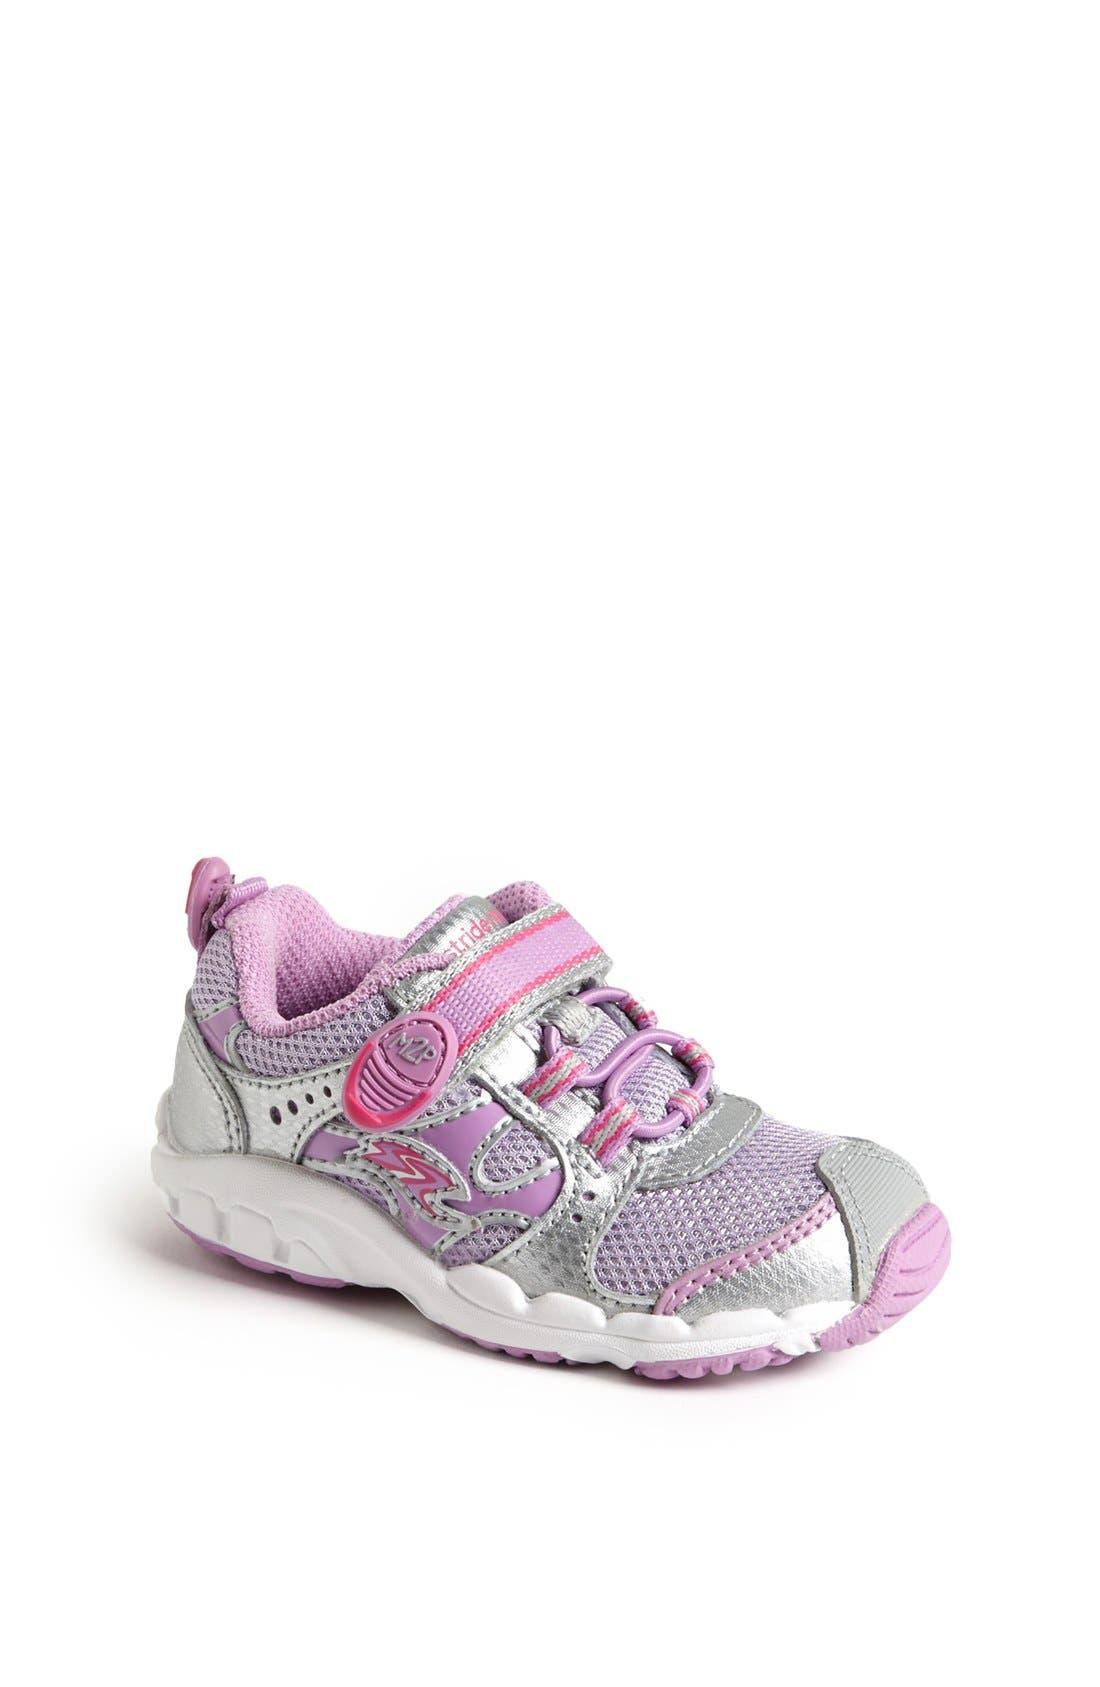 Alternate Image 1 Selected - Stride Rite 'Made 2 Play™ - Reagan' Sneaker (Baby, Walker & Toddler)